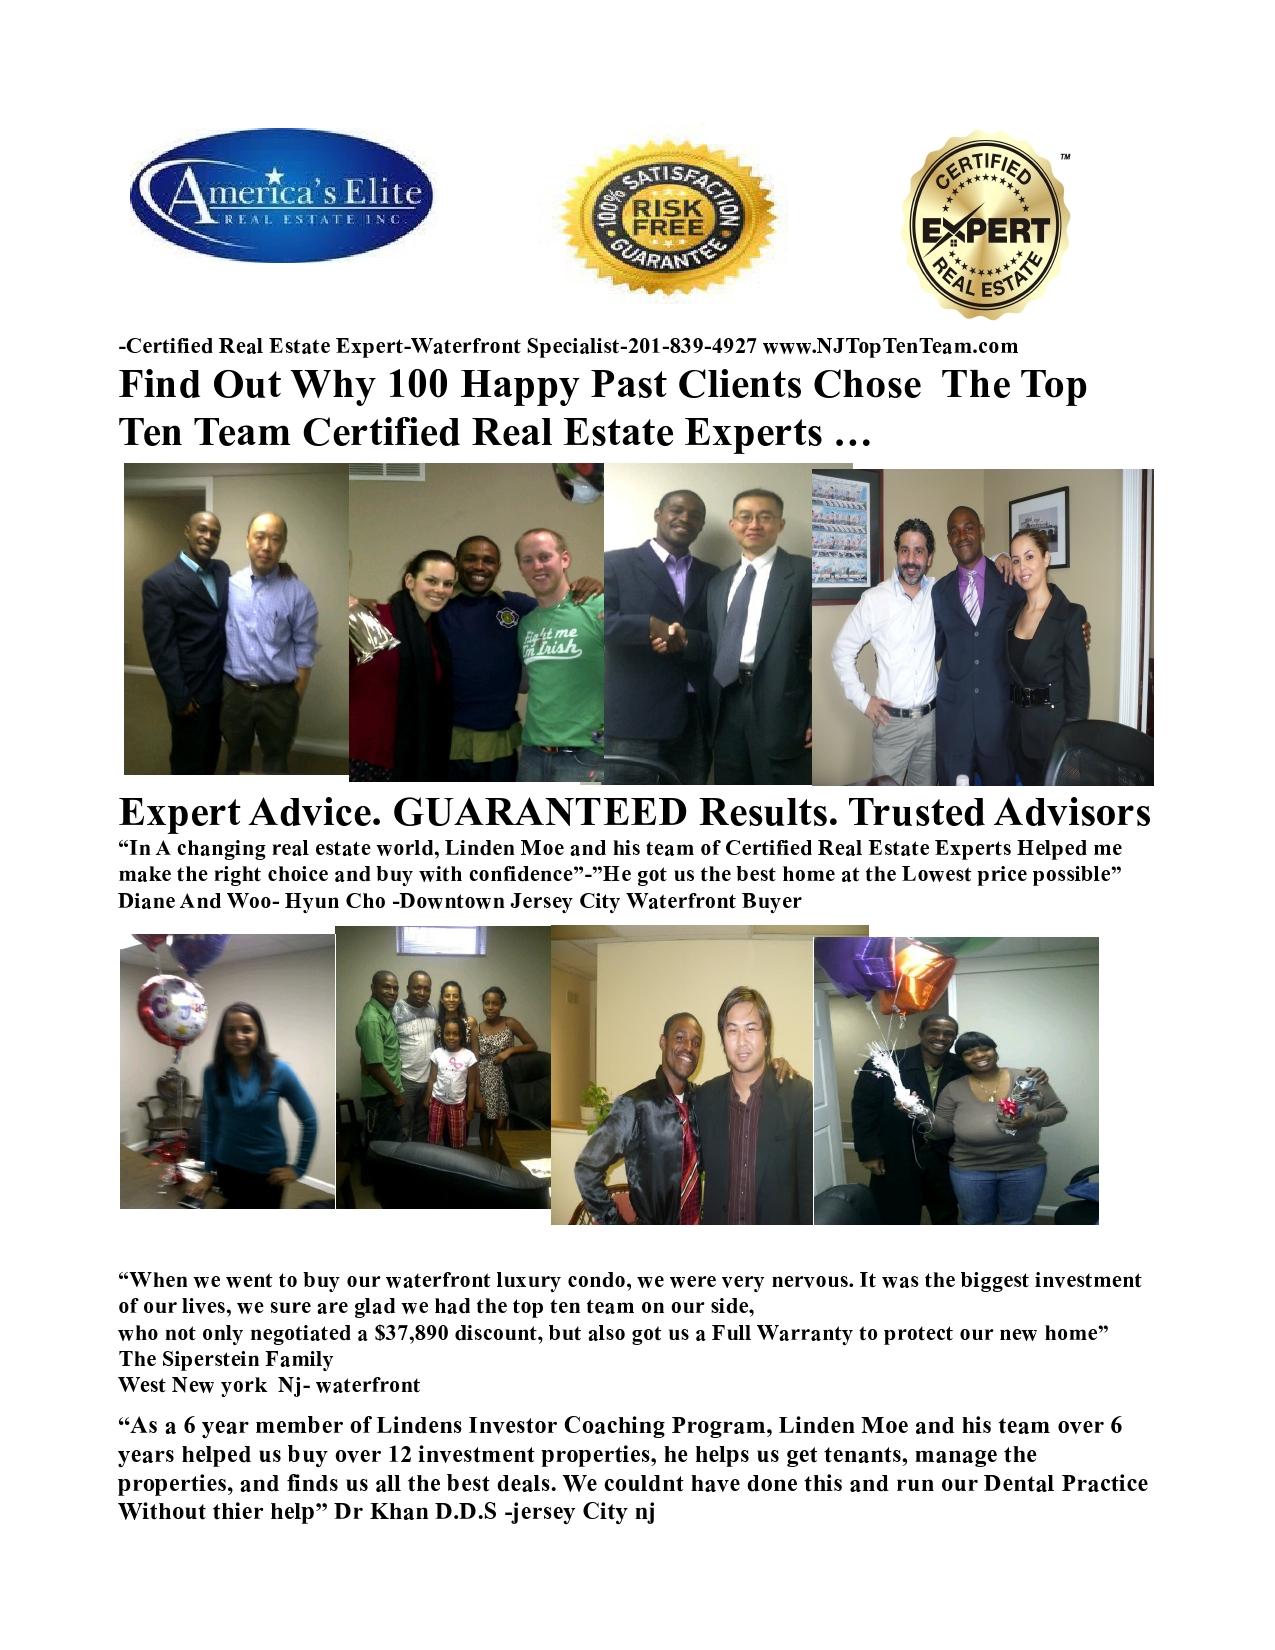 Linden Moe Real Estate Experts Reviews